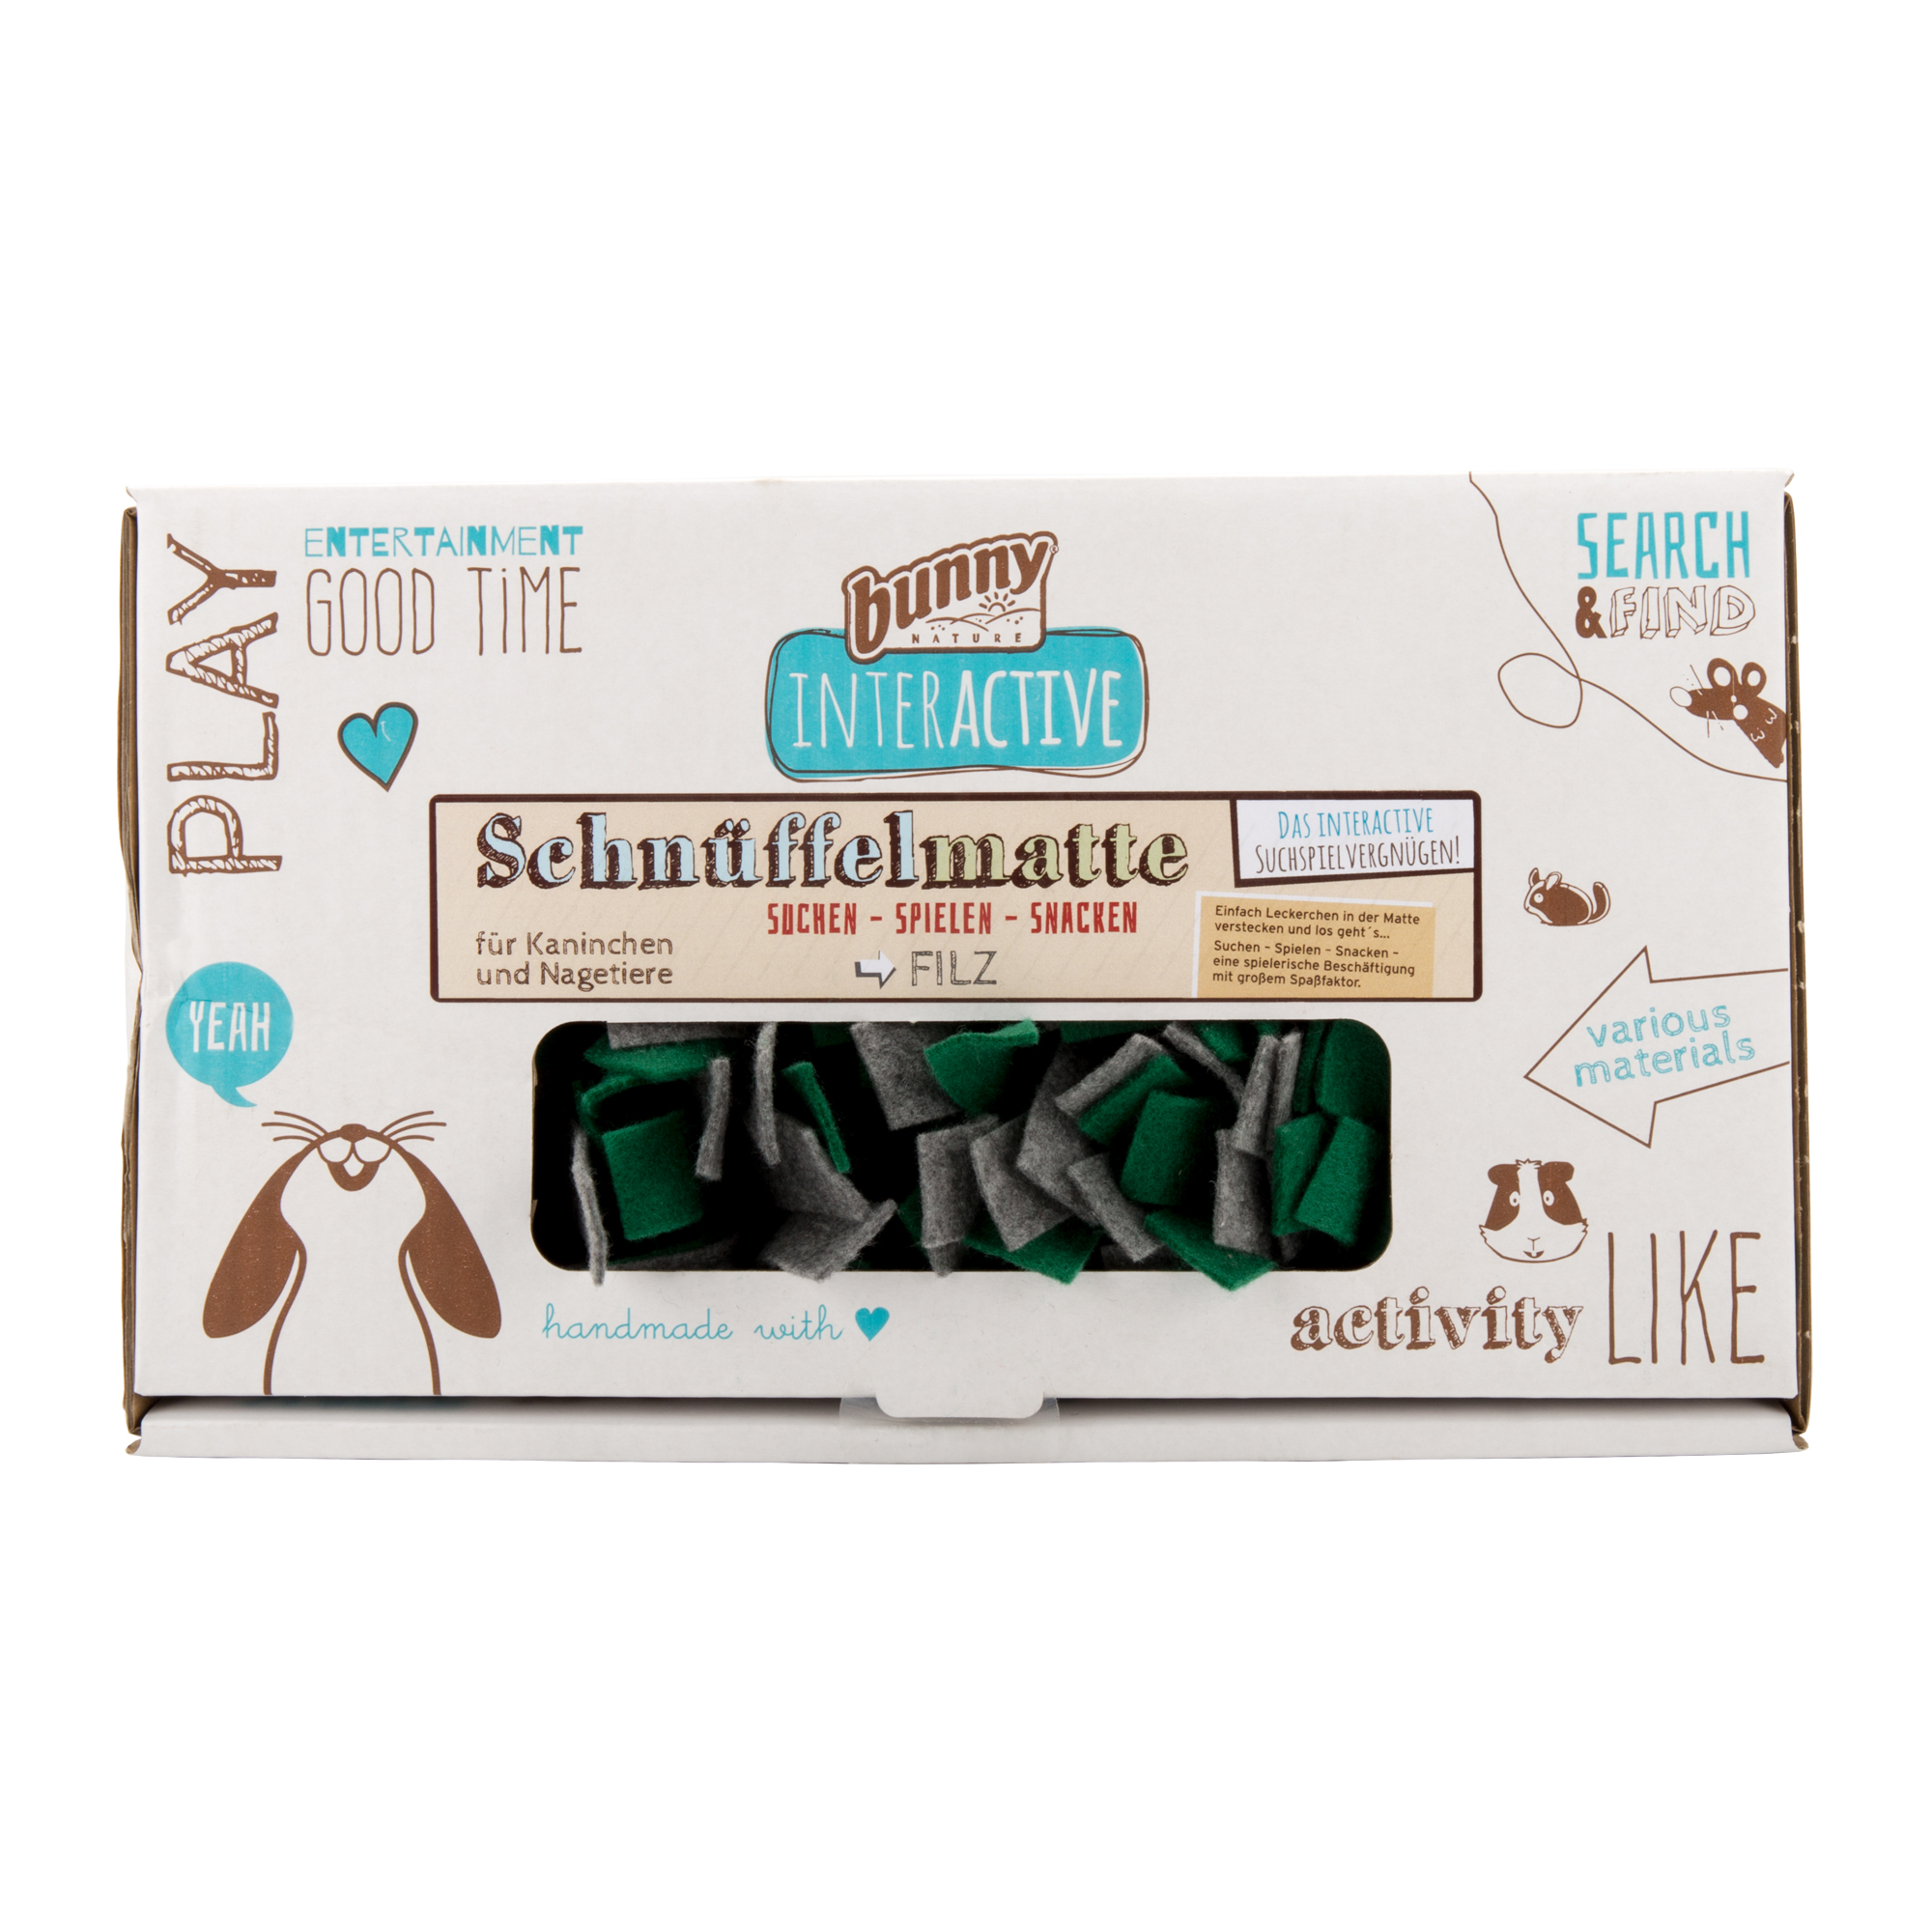 Bunny Nature Schnüffelmatte Filz - Grau / Grün